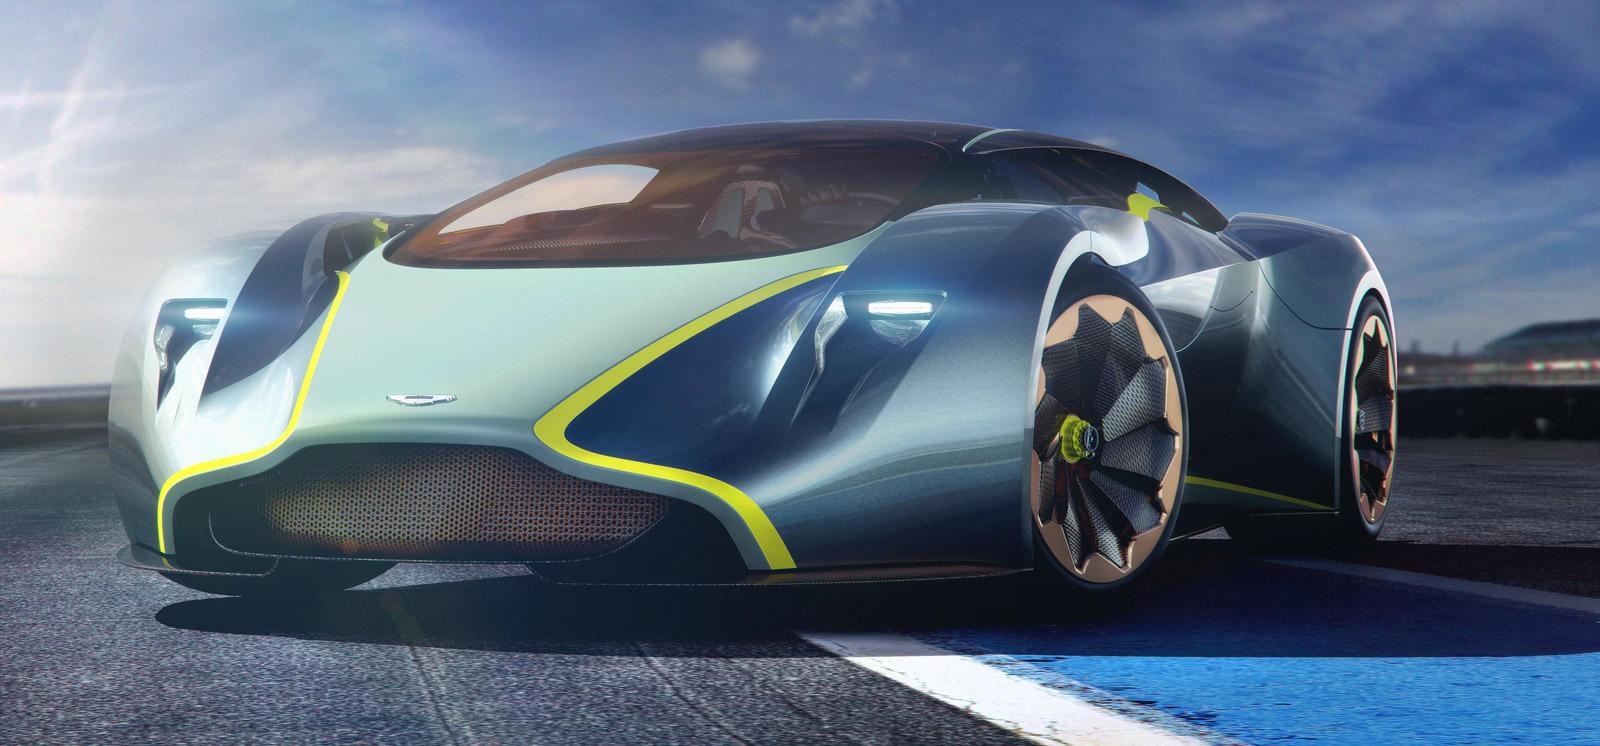 Aston Martins Vision Gran Turismo Concept Is The DP 100